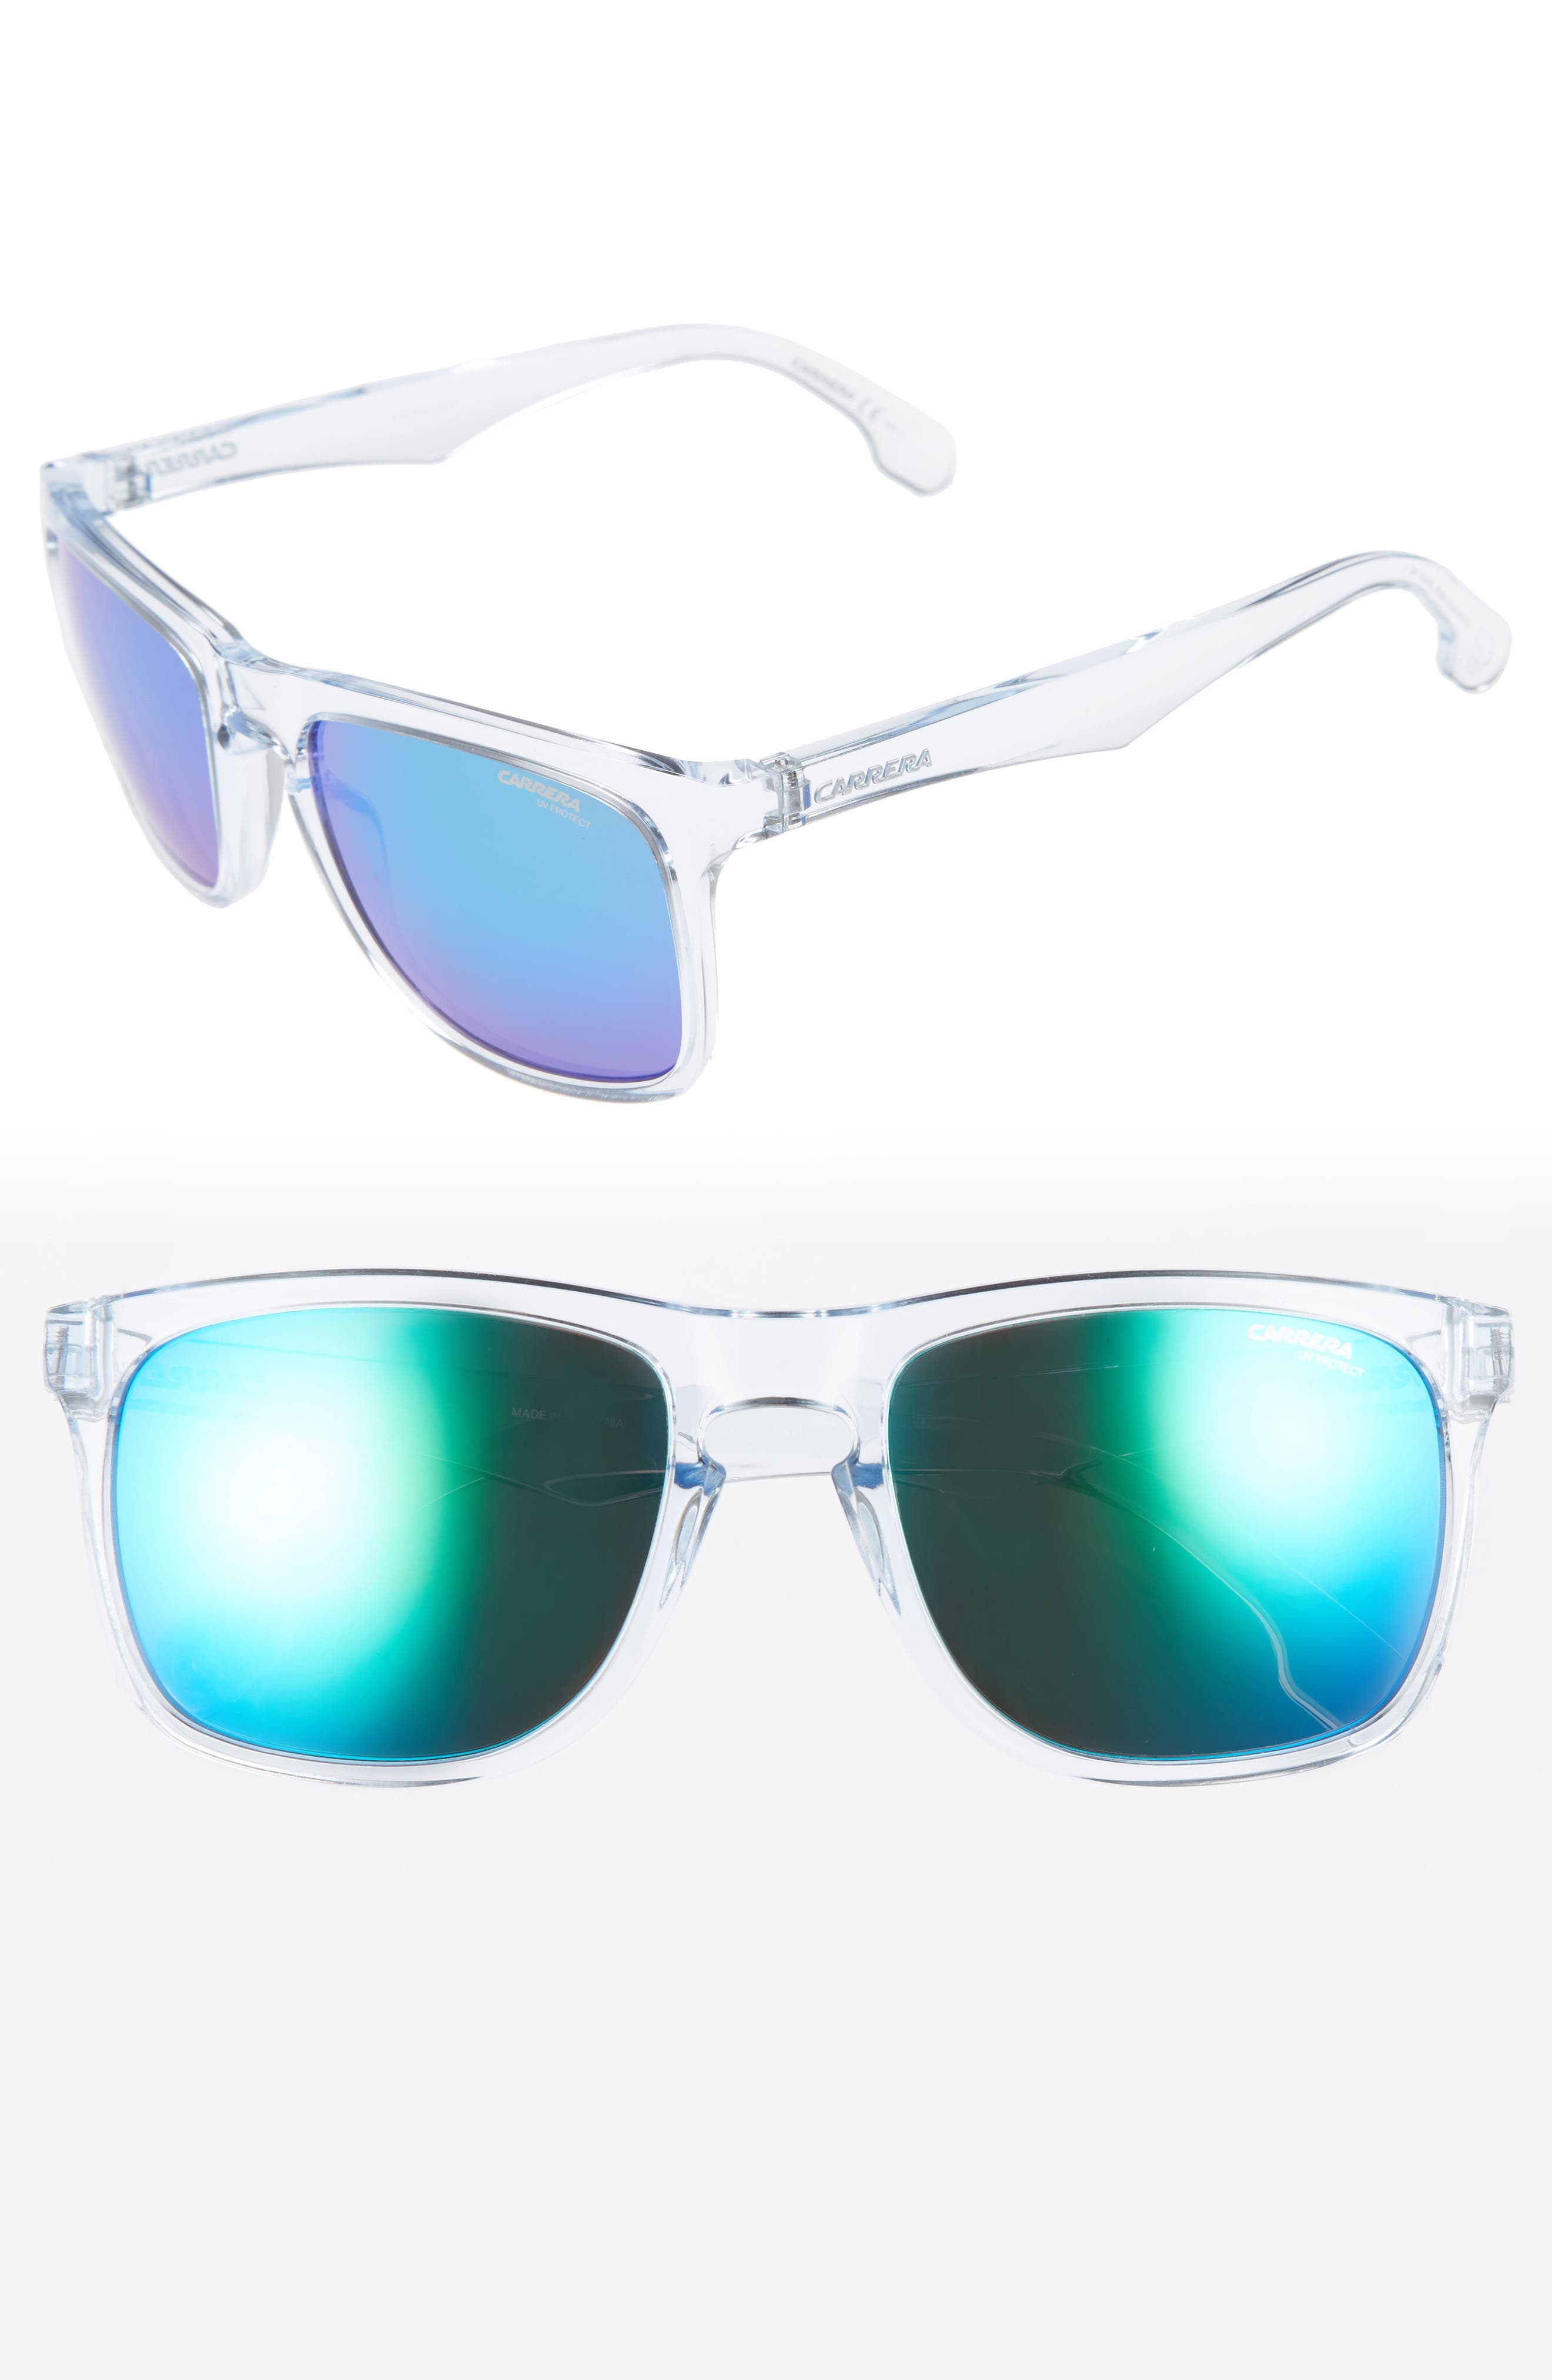 Alternate Image 1 Selected - Carrera Eyewear 56mm Mirrored Lens Sunglasses